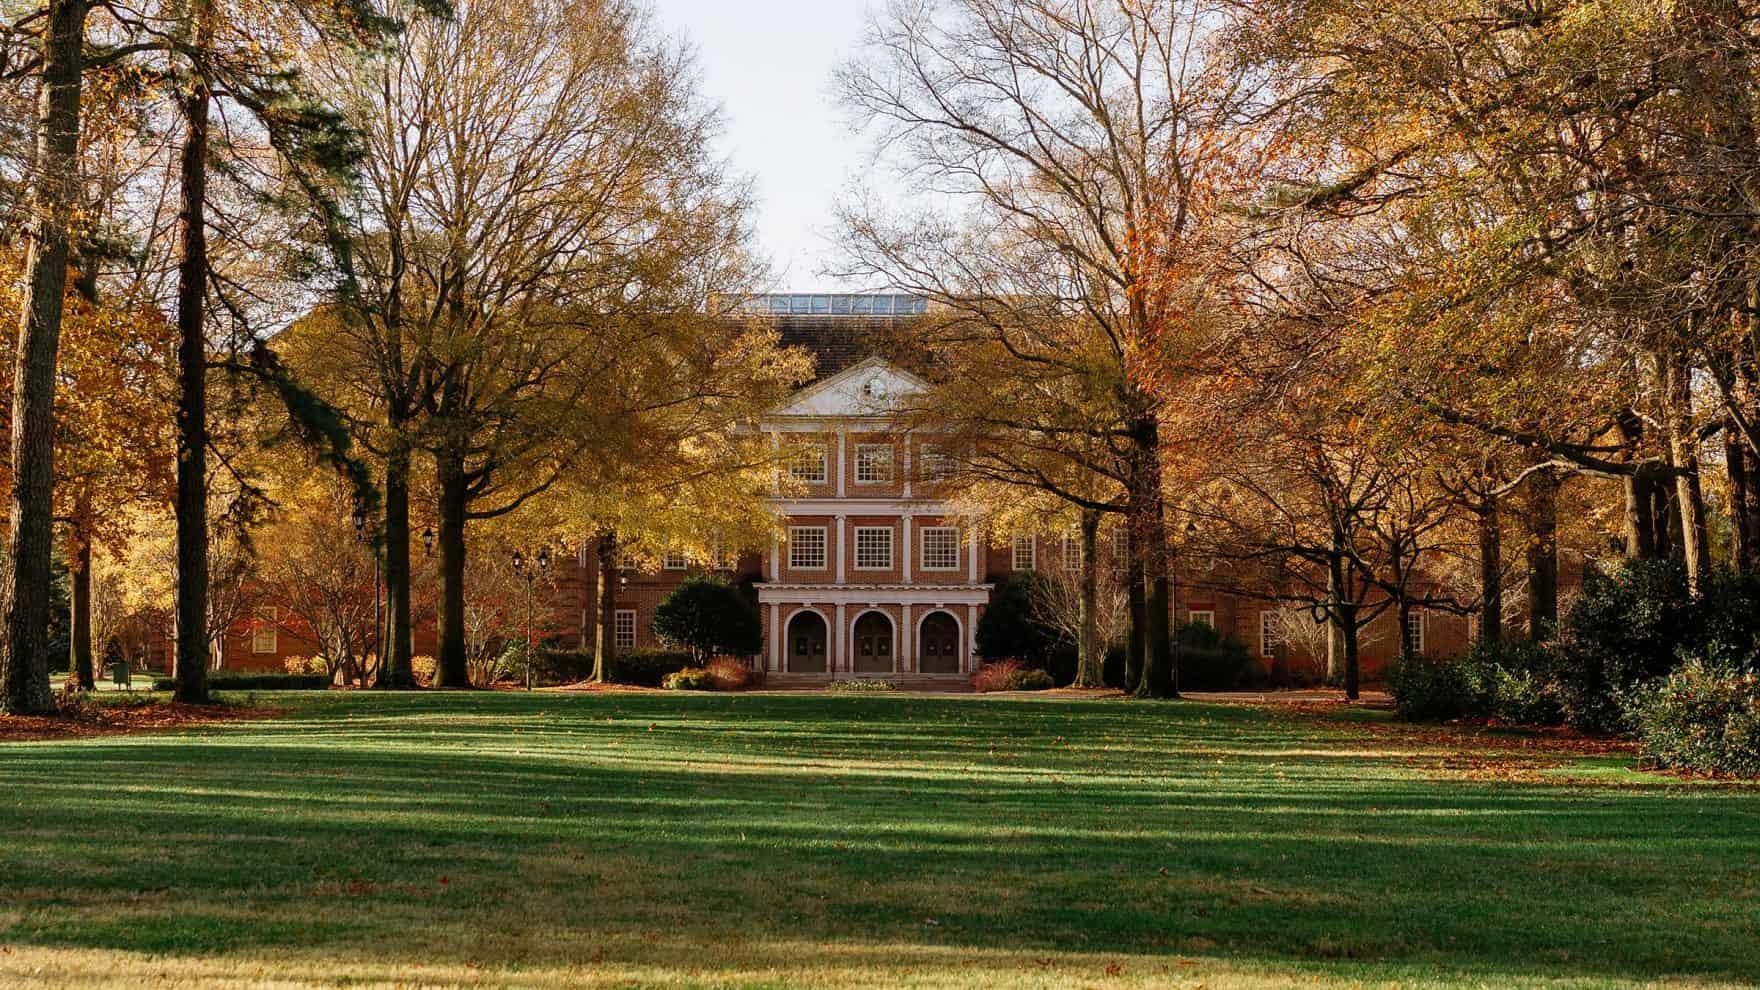 Regent University Opens Fall 2020 in Virginia Beach, 23456